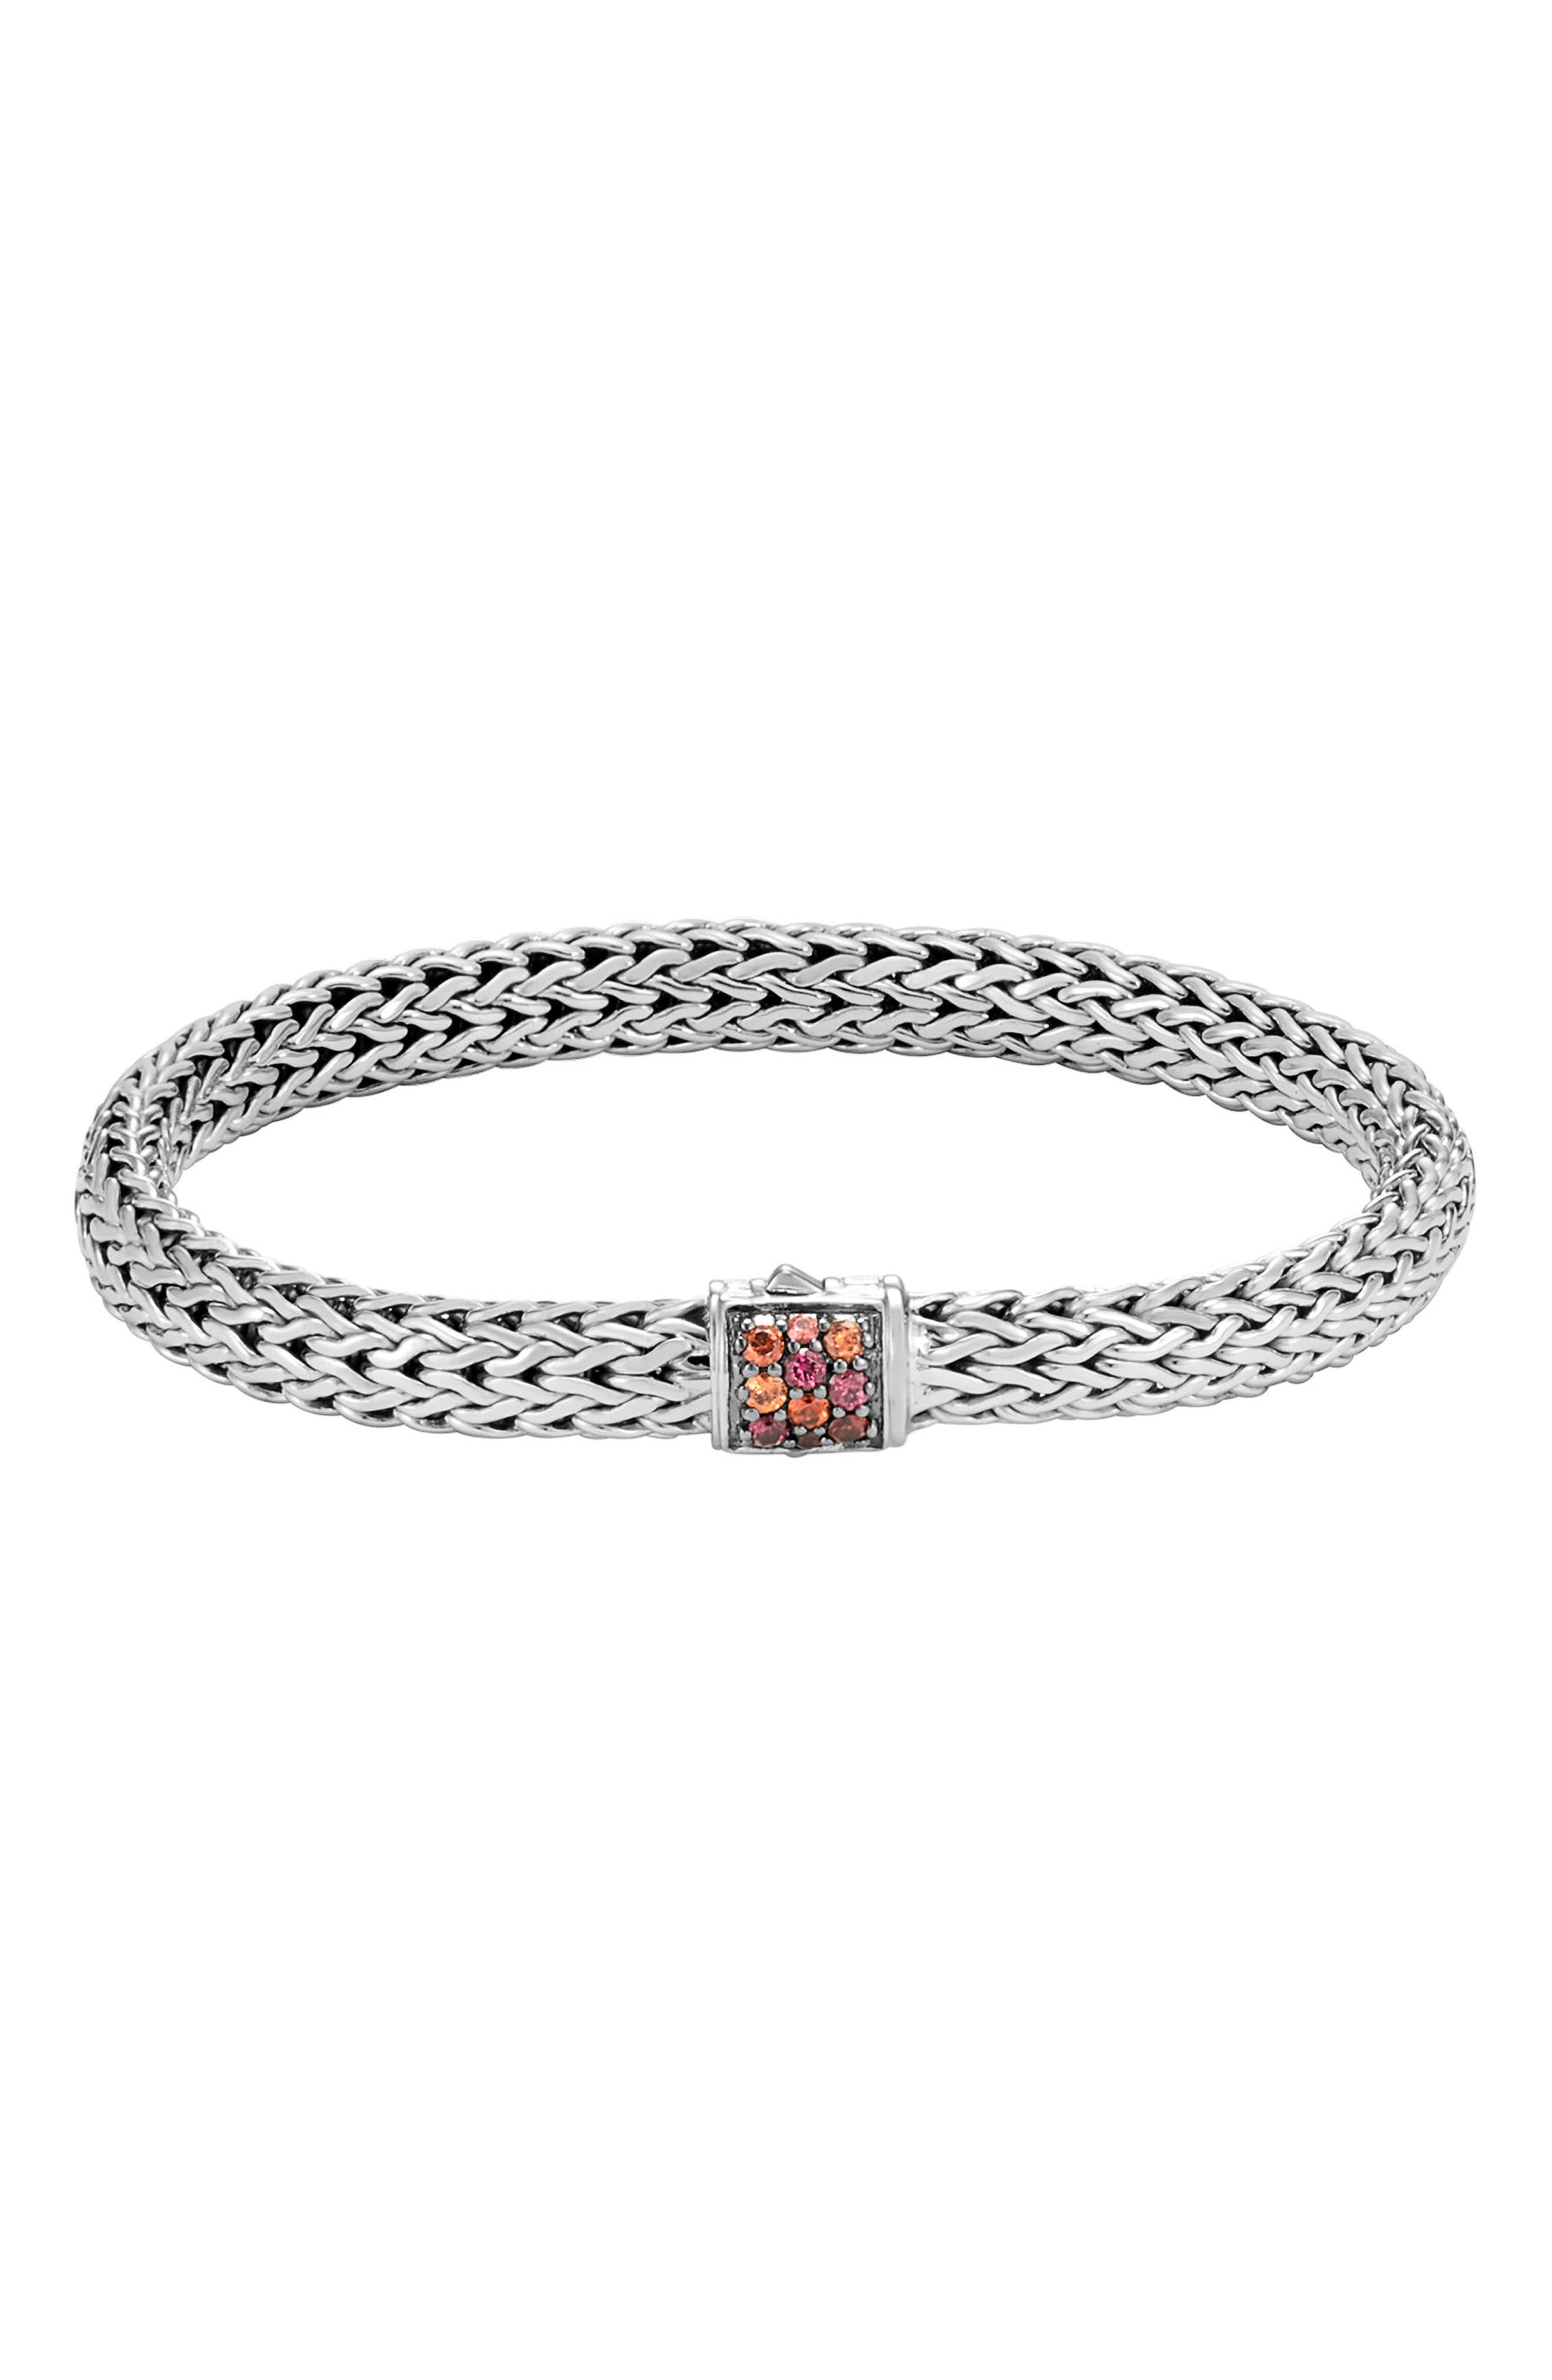 Main Image - John Hardy Classic Chain Small Bracelet